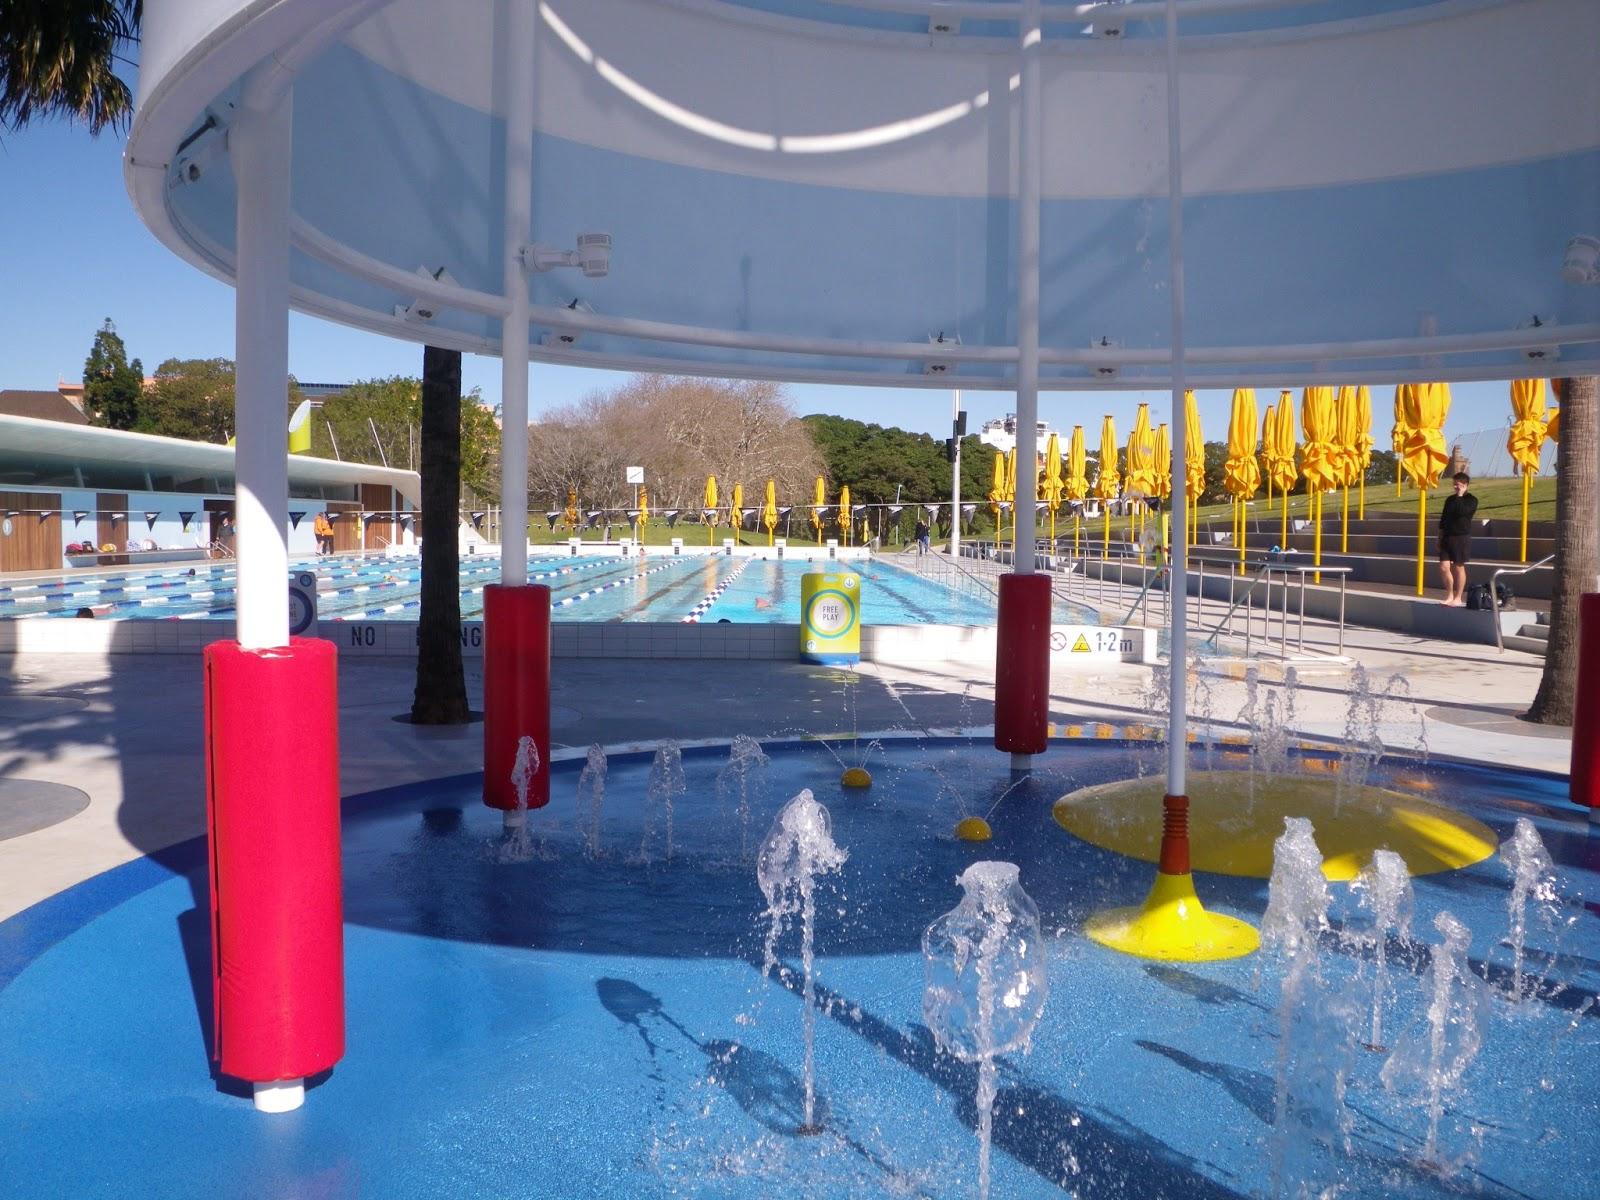 17 albert park swimming pool hours decor23 for Pool design hours